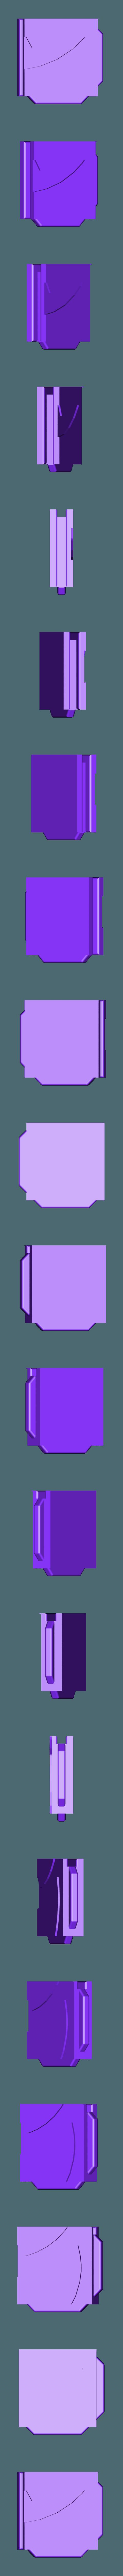 Piece - Part 13.stl Download free STL file Taquin CULTS / Sliding Puzzle • 3D print model, Valelab3D